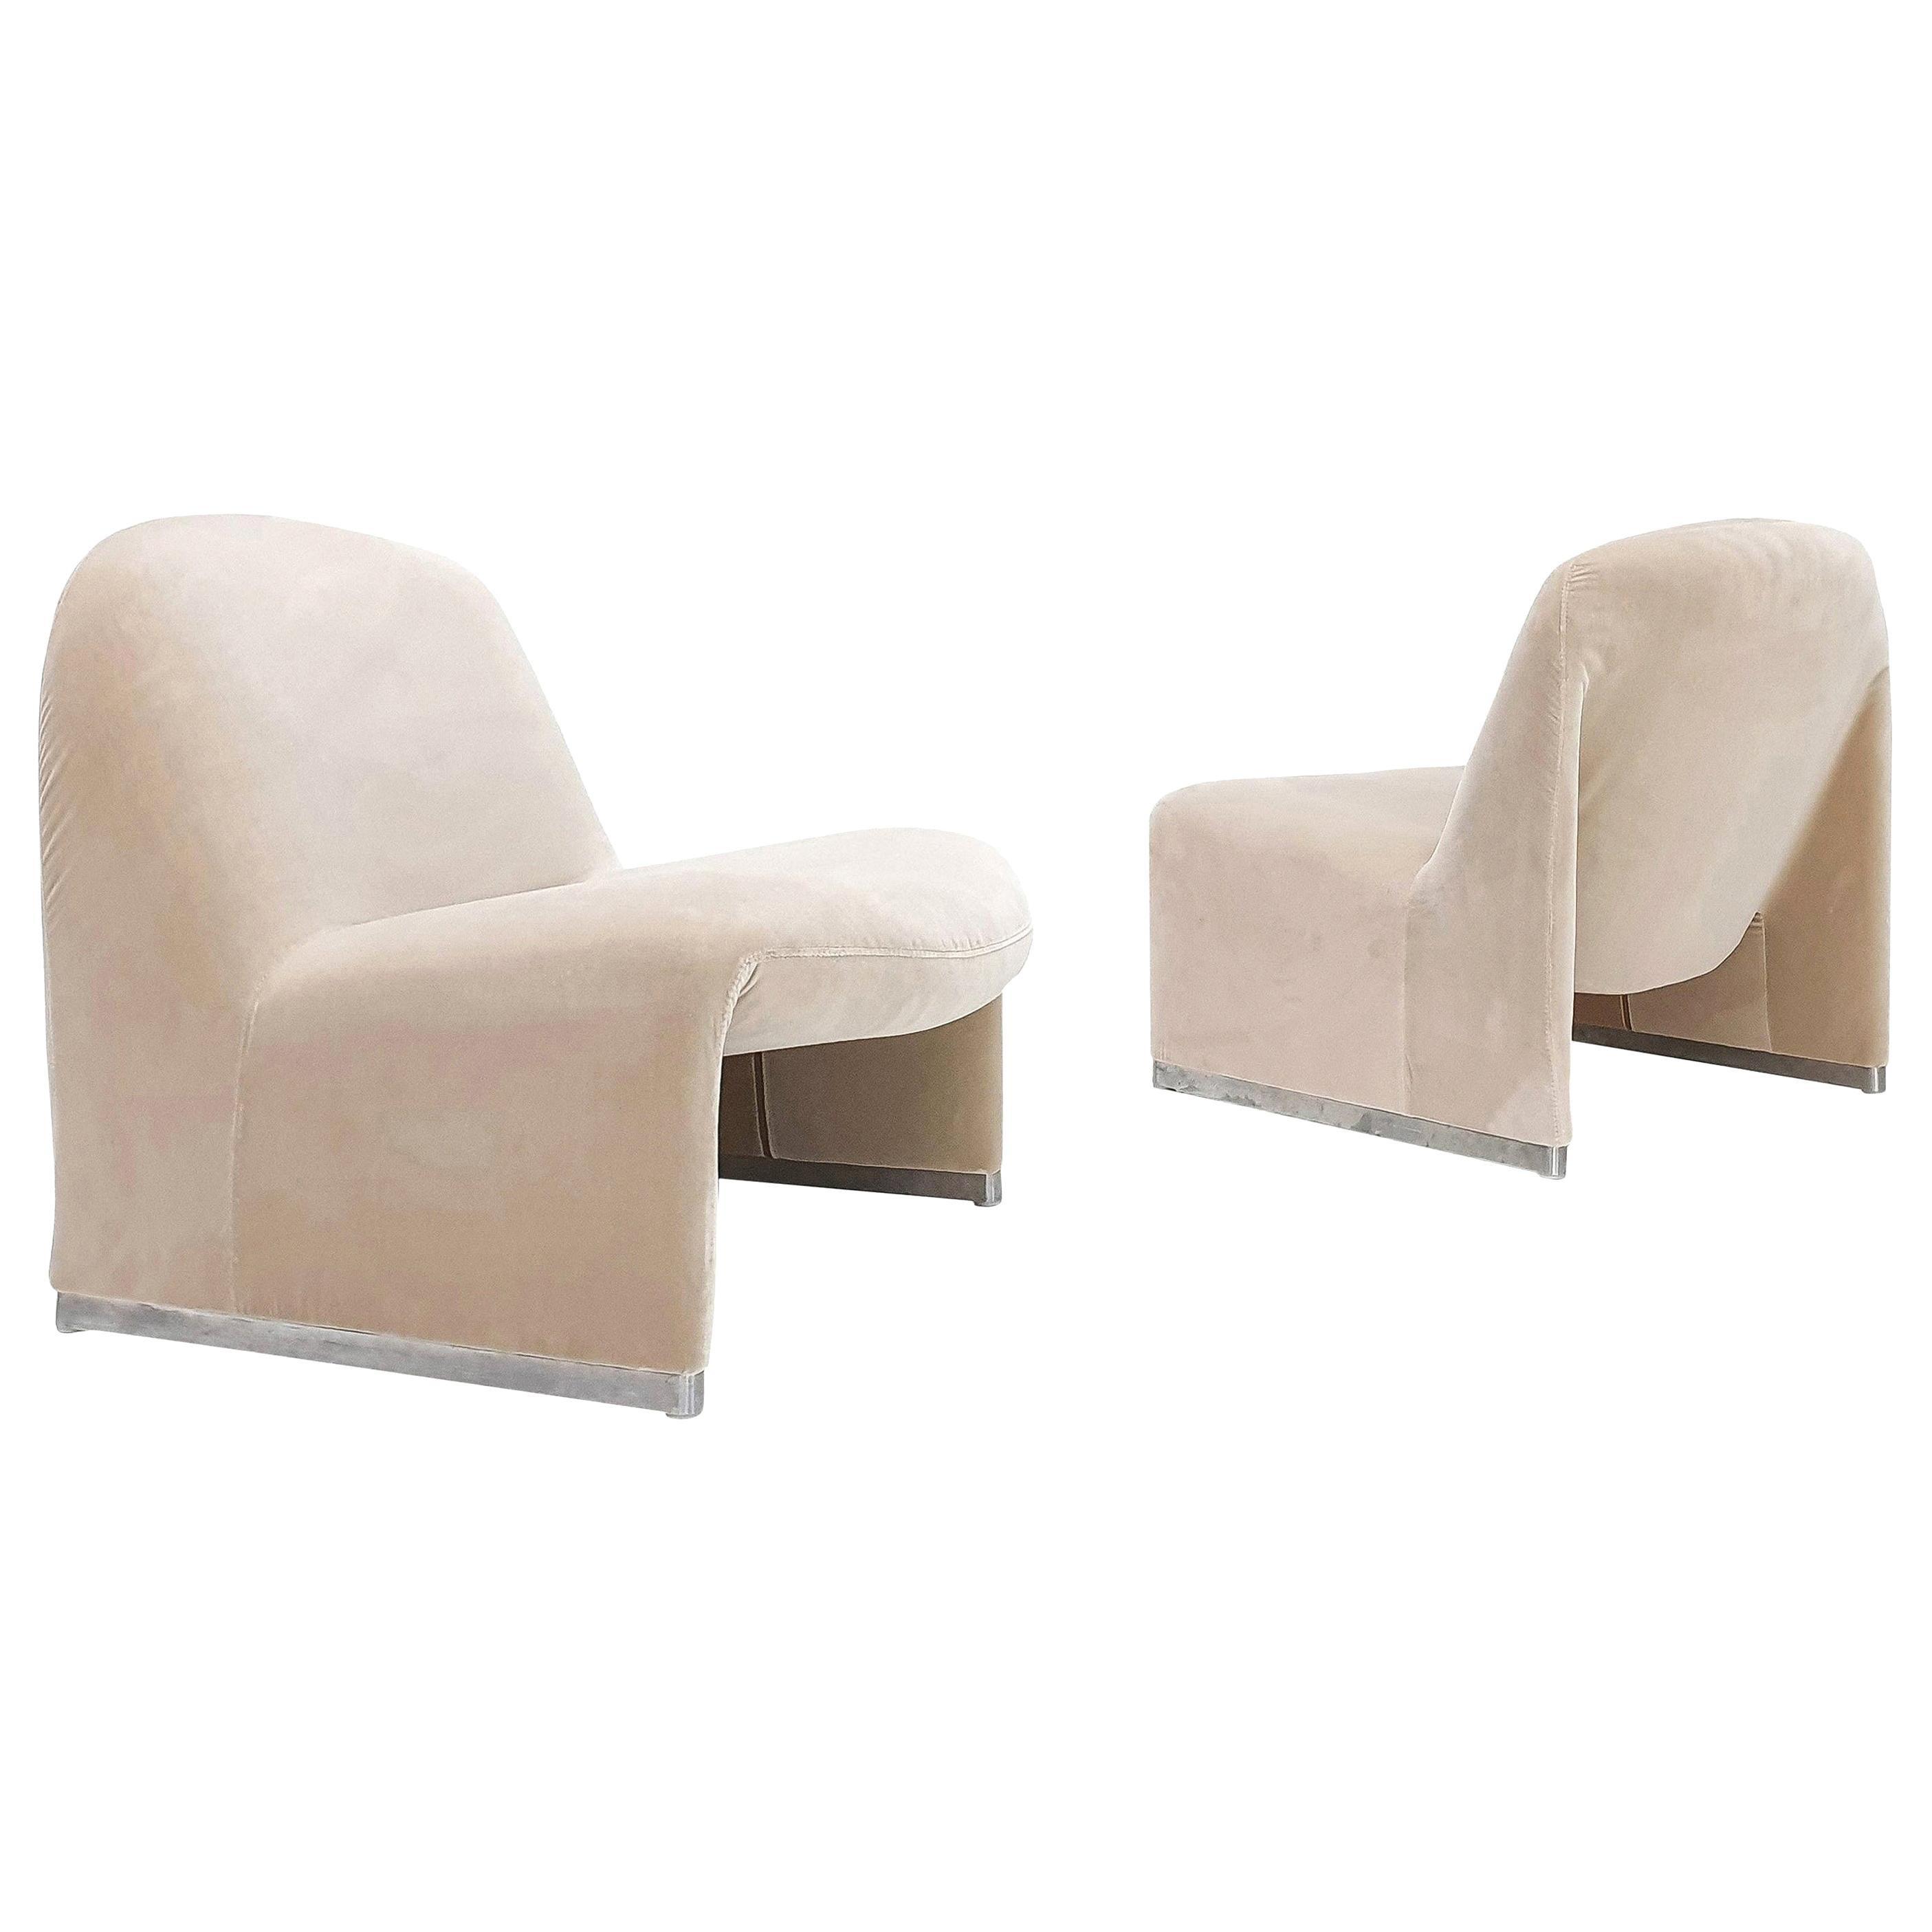 "Pair of Giancarlo Piretti ""Alky"" Chairs in New Velvet, Artifort, 1970s"